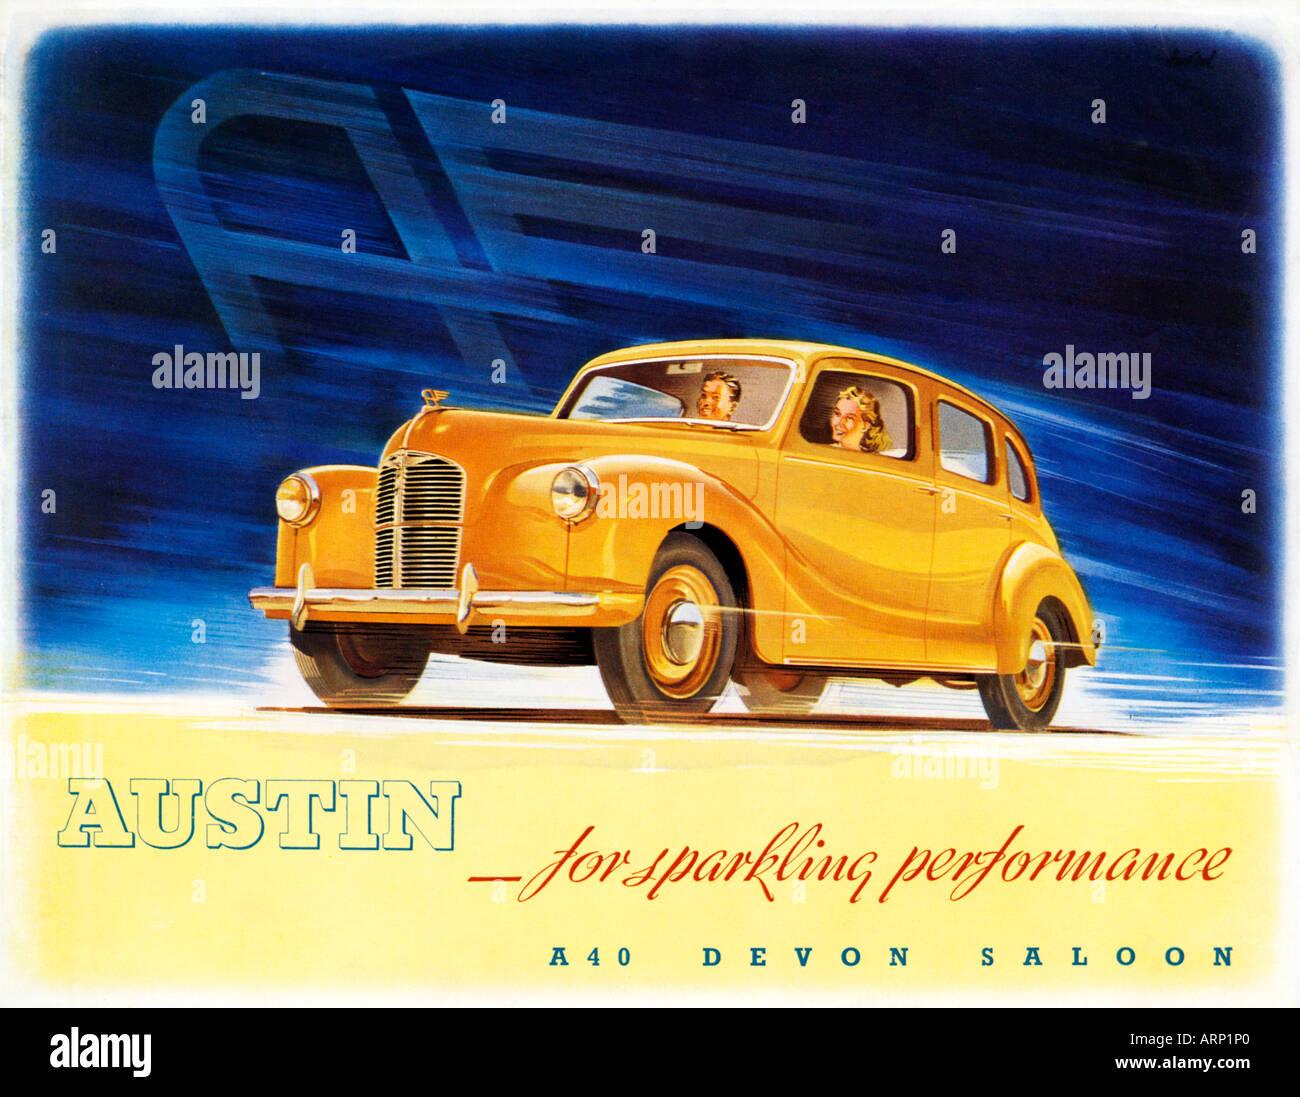 Austin A40 Devon Saloon 1940s brochure for the popular English car - Stock Image